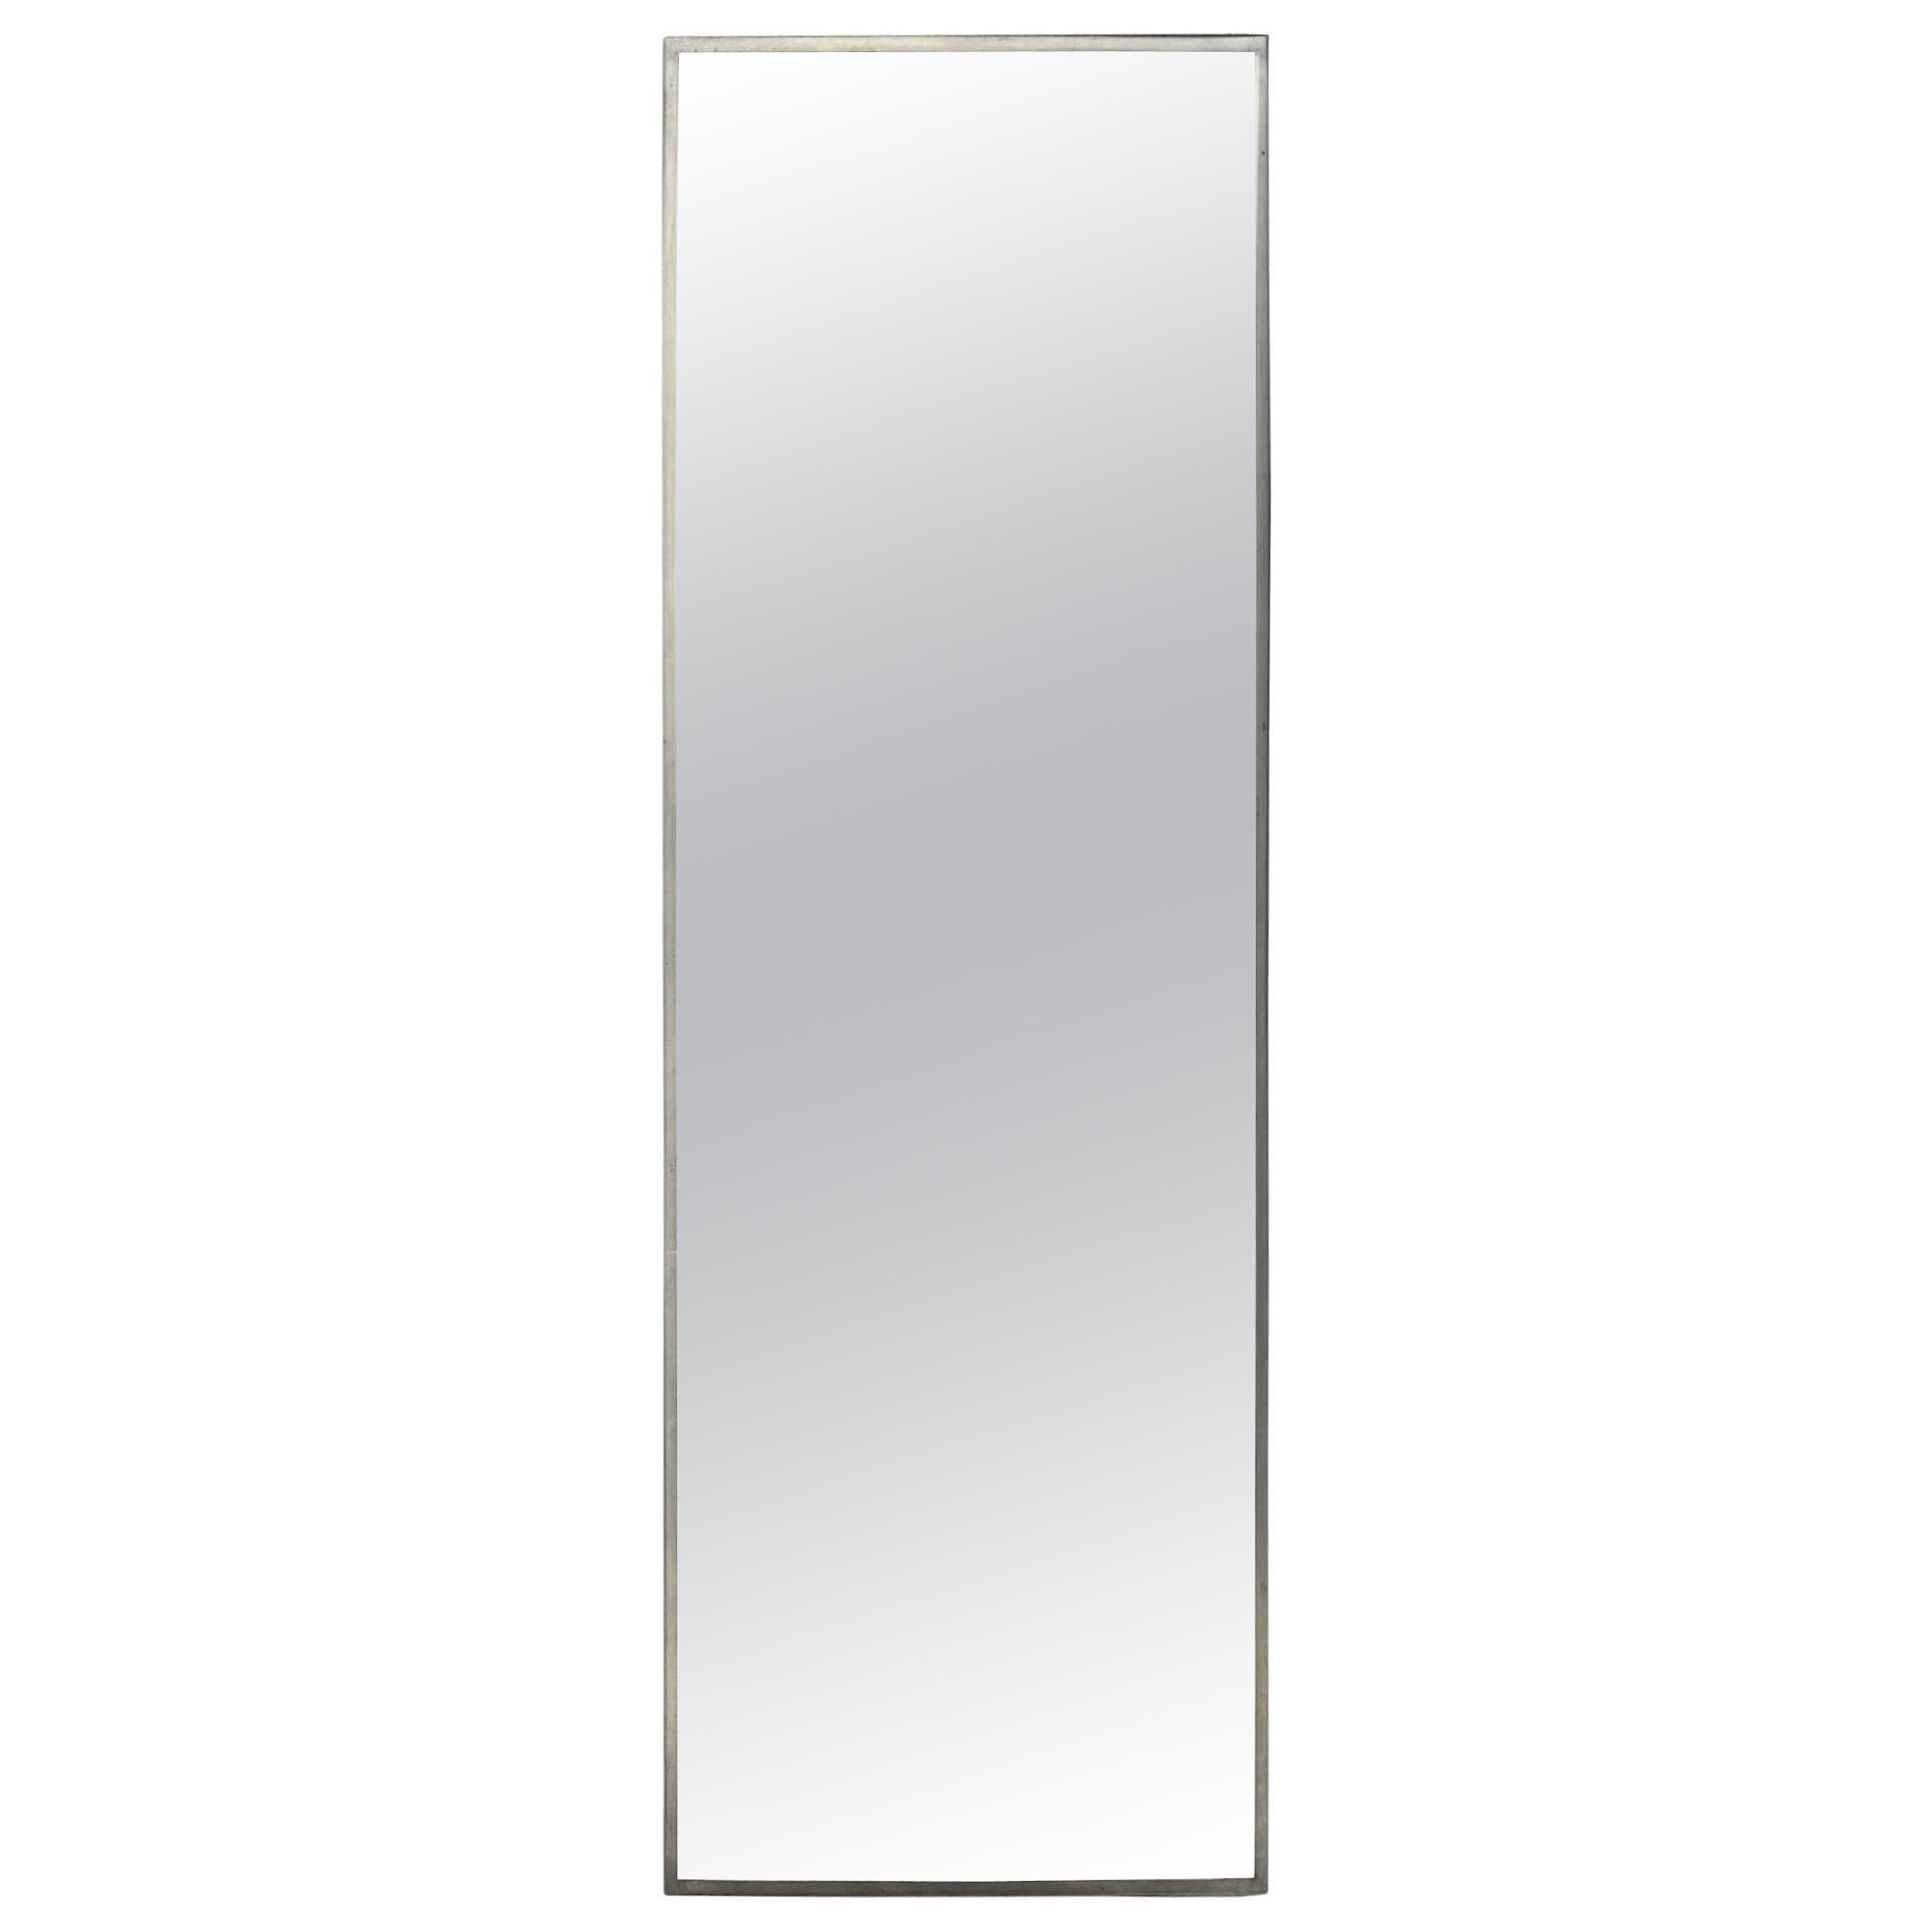 Mirror Designed by Björn Trägårdh for Svenskt Tenn, Sweden, 1930